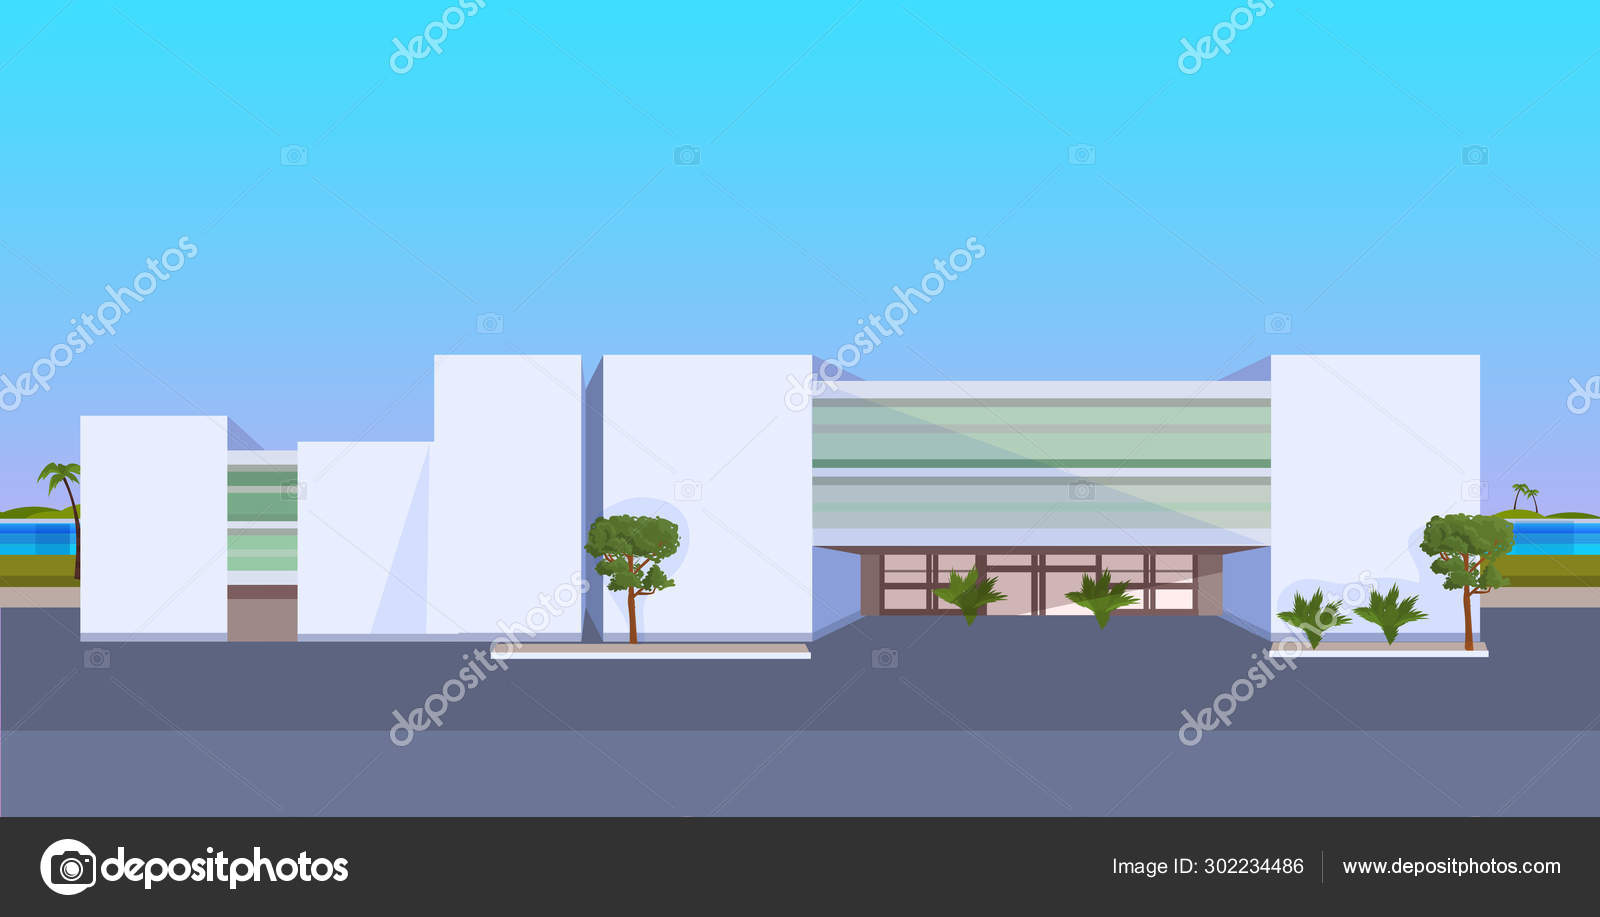 Modern Hotel Office Building Exterior Commercial Business Center Design Landscape Background Flat Horizontal Stock Vector C Mast3r 302234486